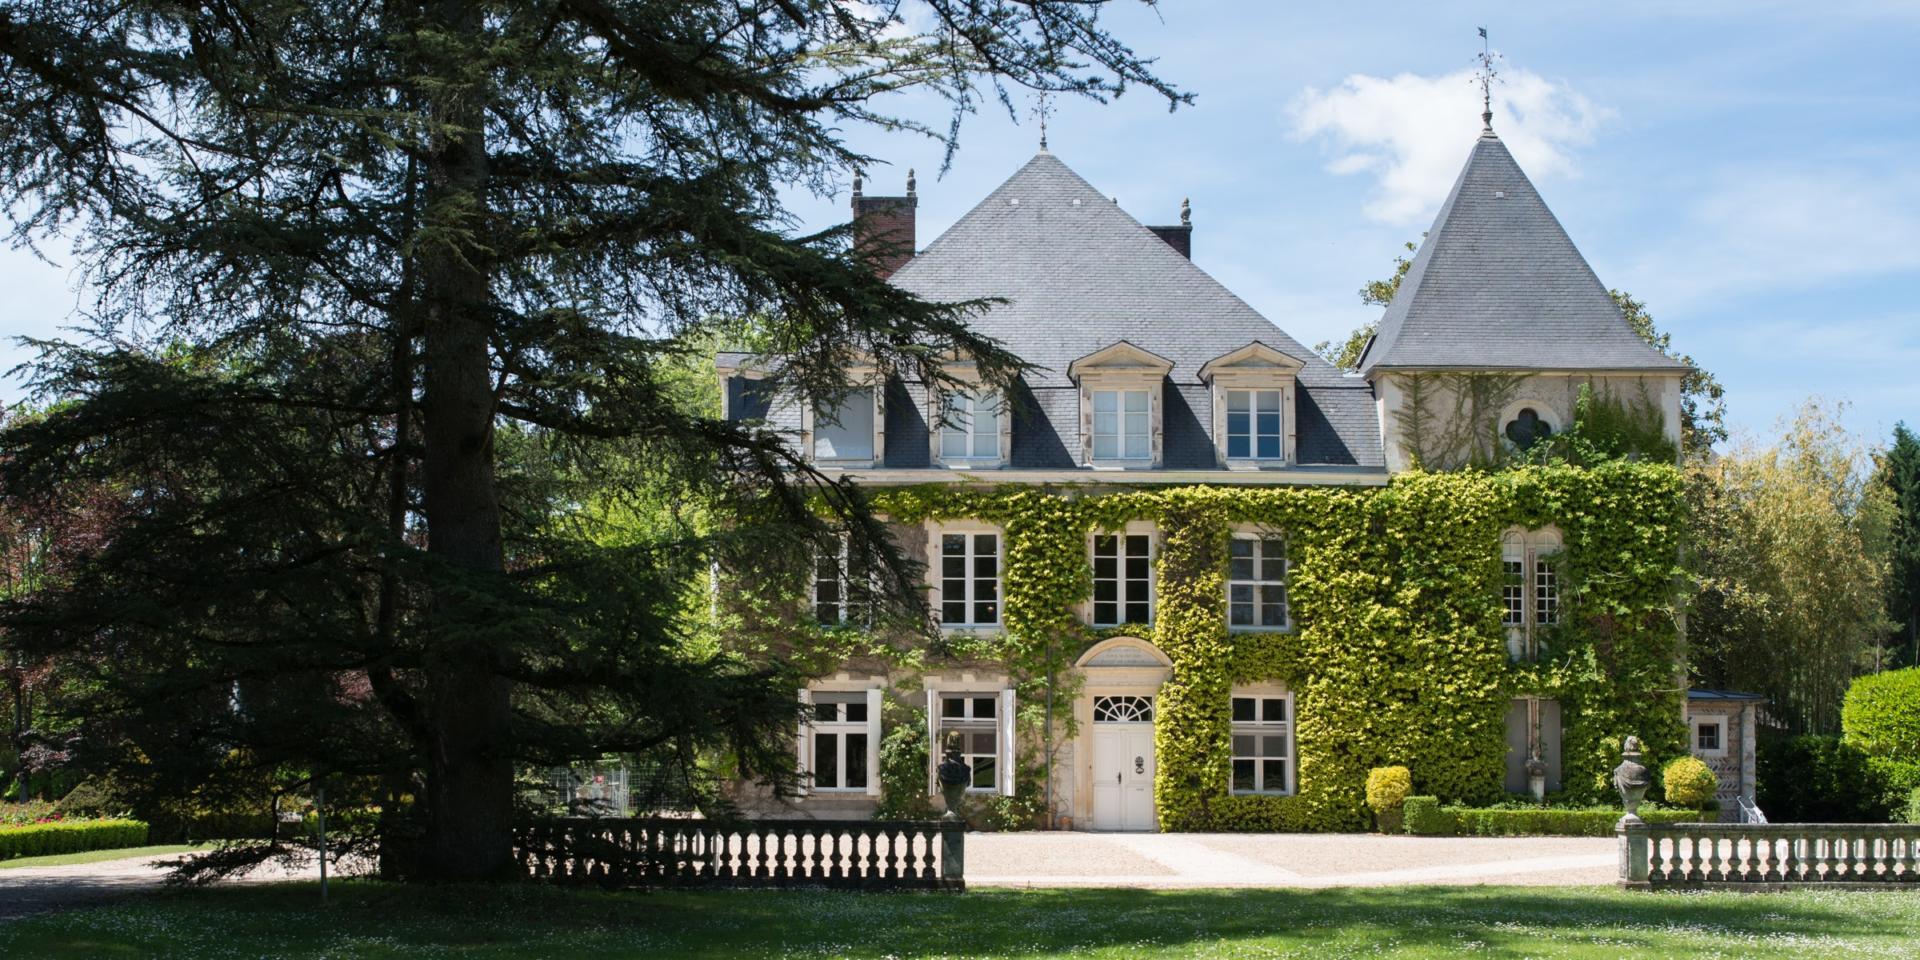 Chateau De Laas